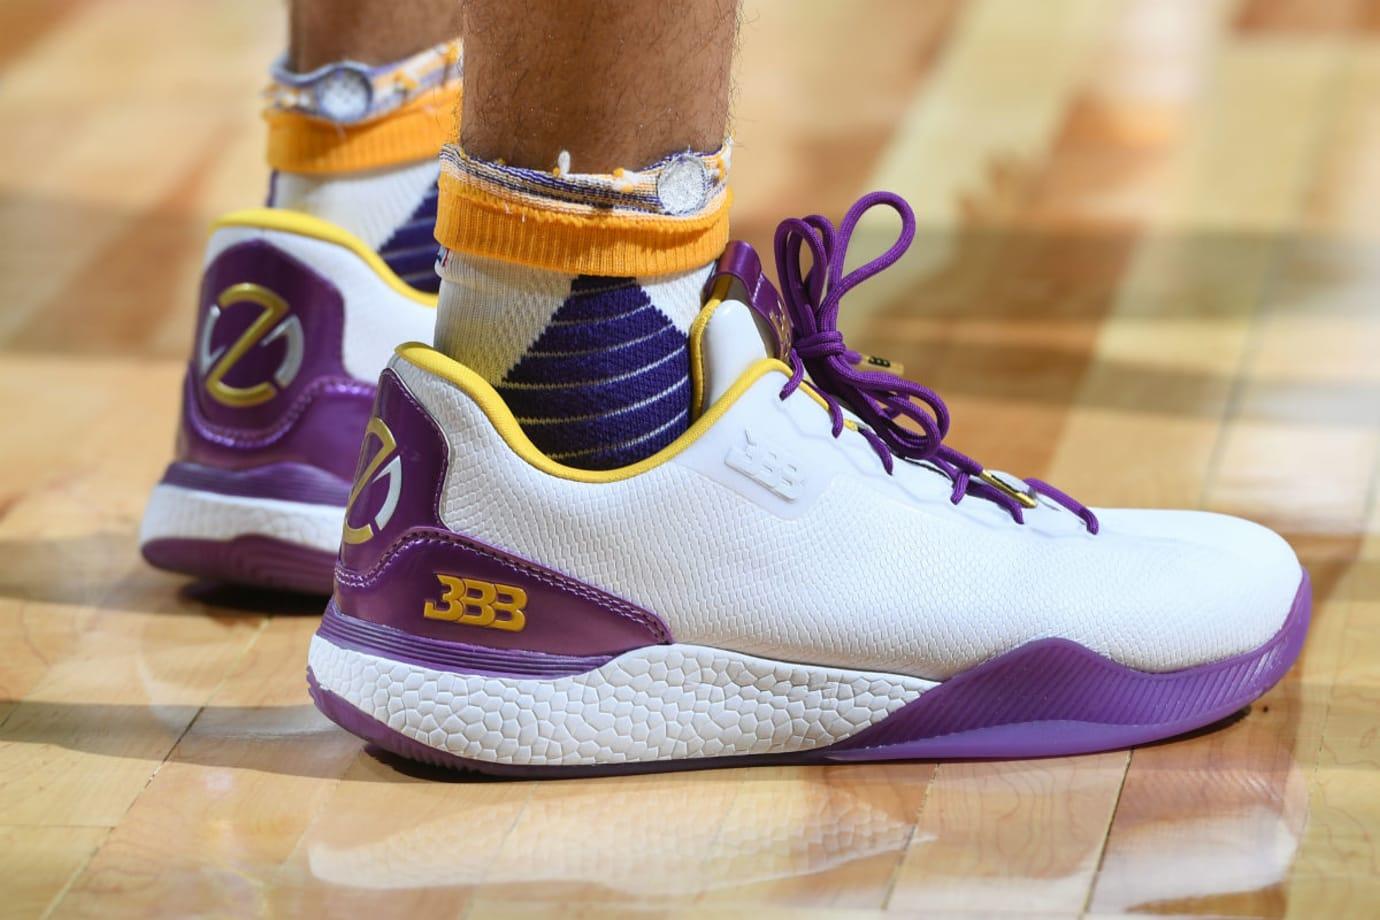 Lonzo Ball Big Baller Brand ZO2 SHO'TIME Lakers Summer League Debut On-Foot